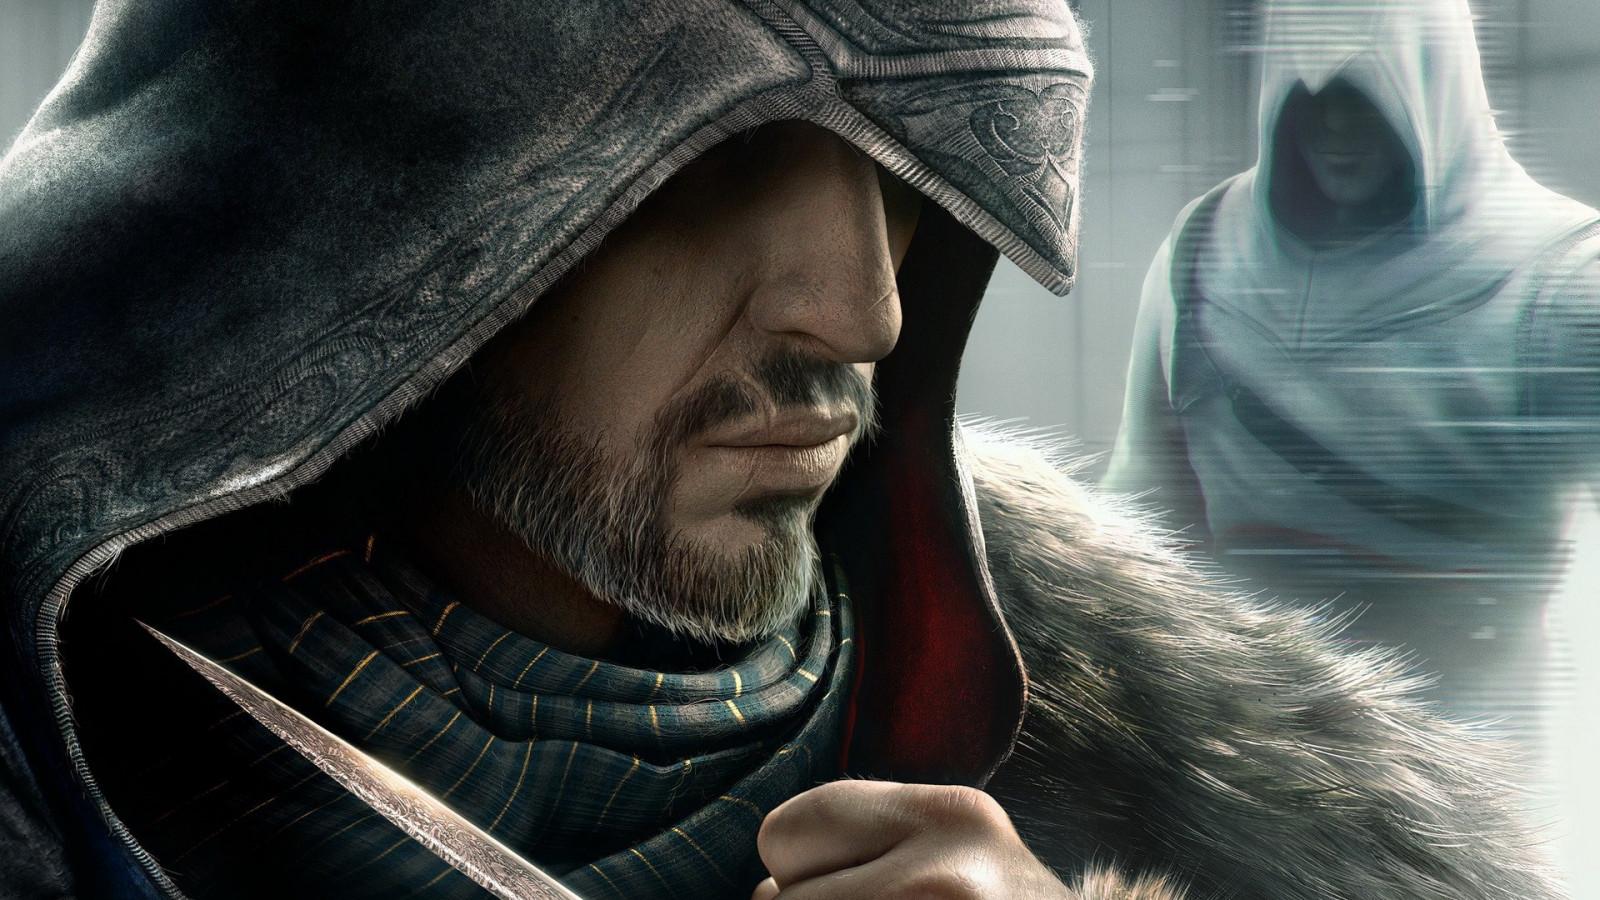 Wallpaper : video games, portrait, Assassin's Creed, Person, assassins, Ezio Auditore da Firenze, Alta r Ibn La Ahad, Assassin's Creed Revelations, man, screenshot 1920x1080 - Obseek - 147811 - HD Wallpapers - WallHere